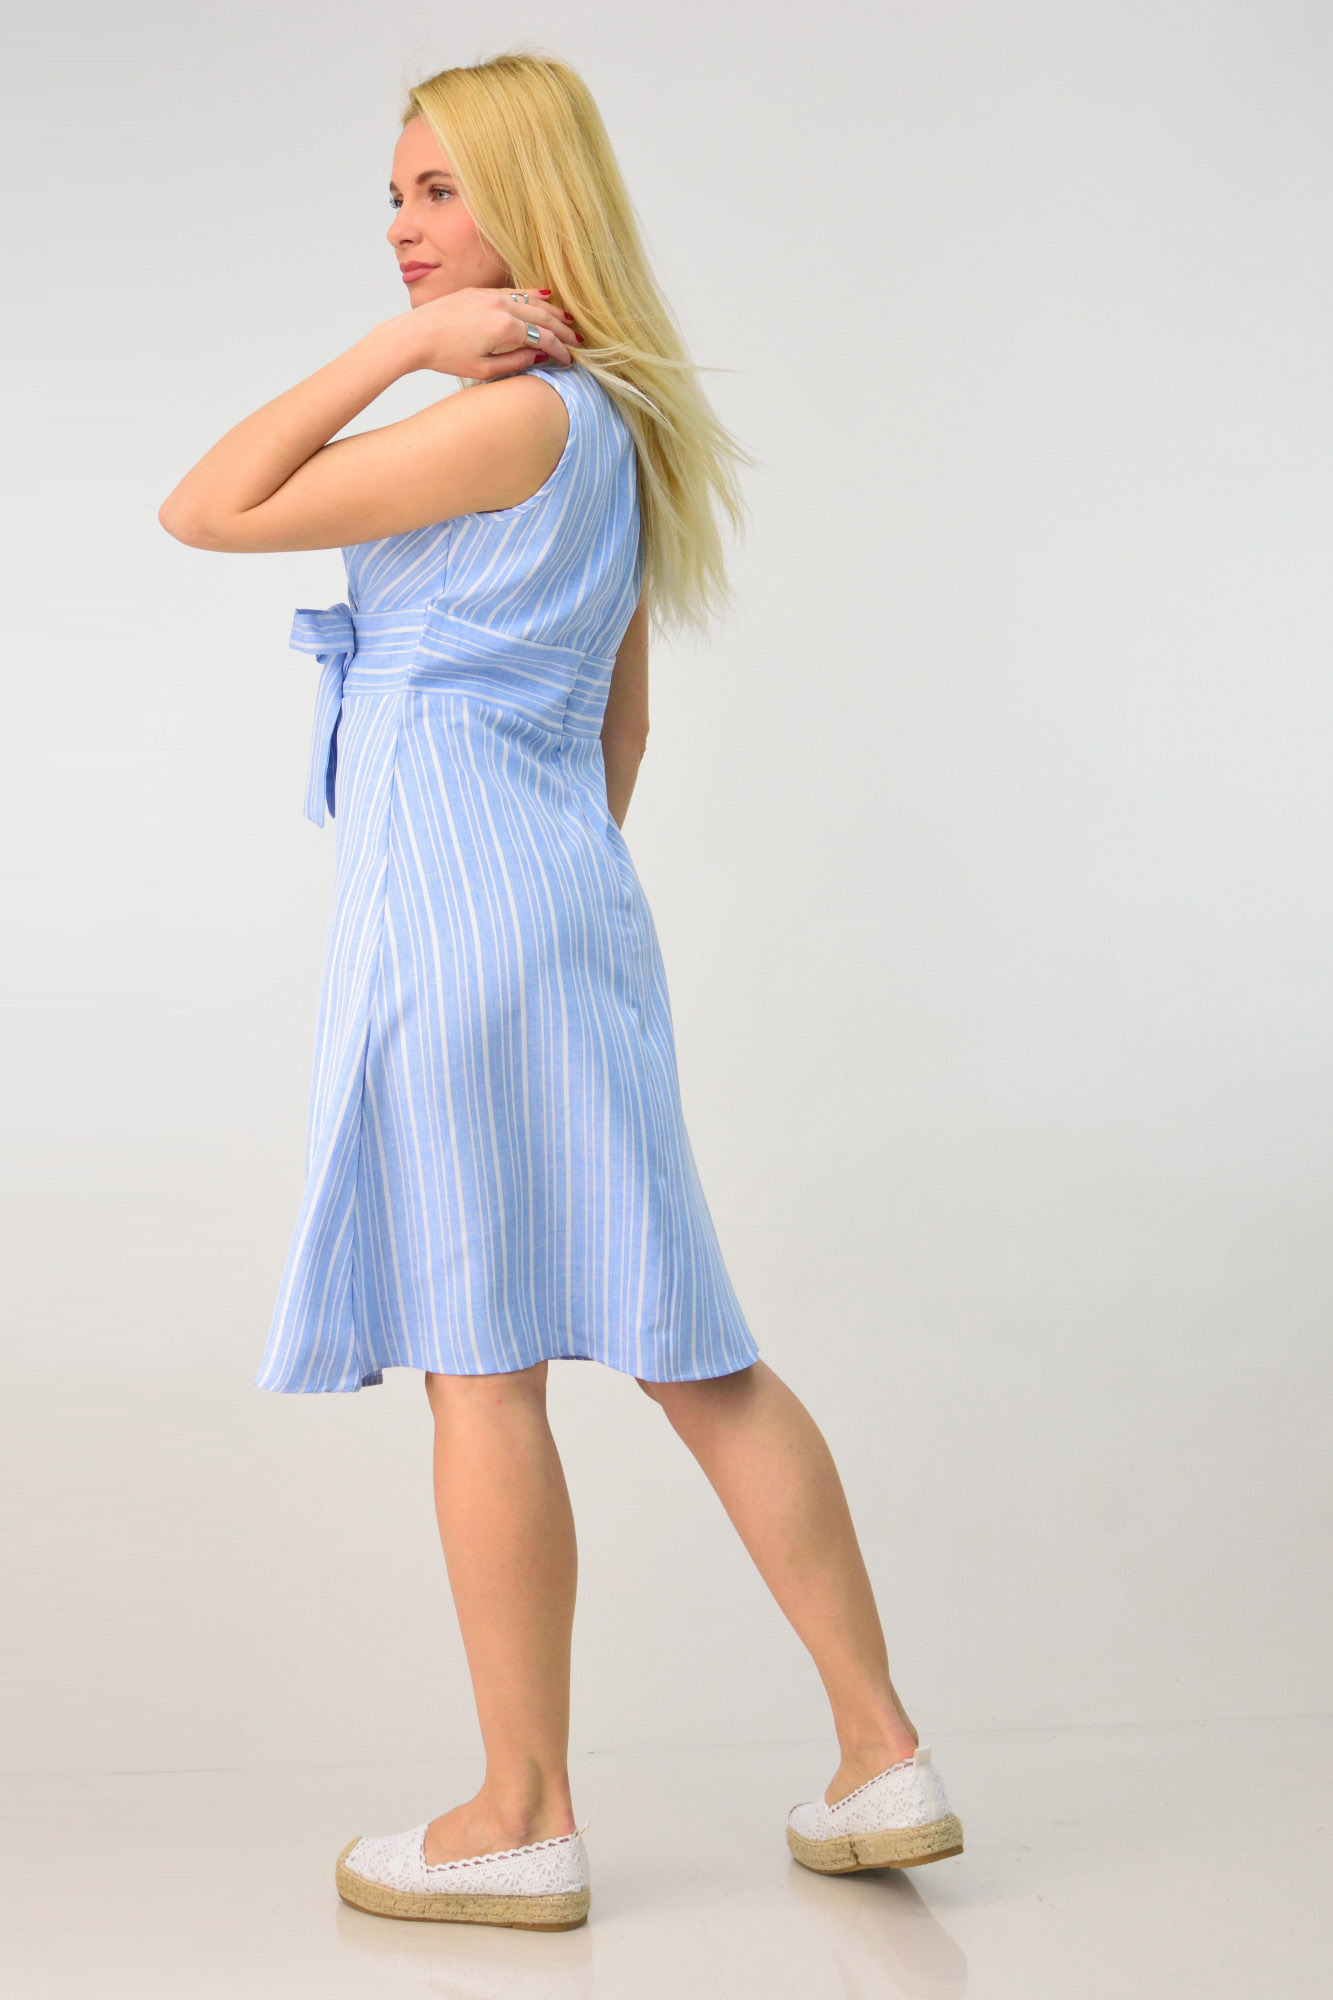 df2d71ae1e47 Κρουαζέ φόρεμα με όψη λινού. Tap to expand